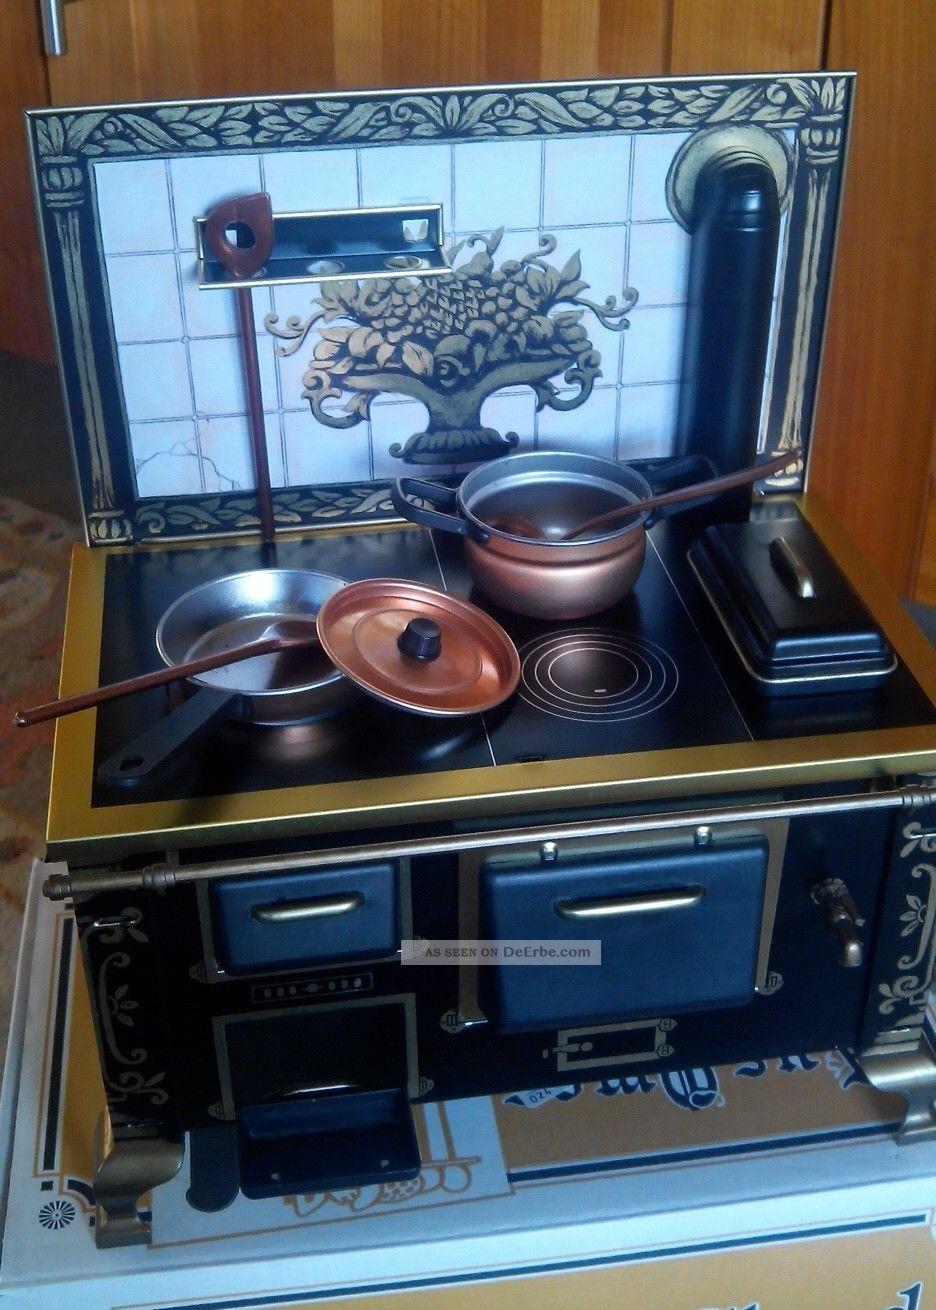 blechherd nostalgie funktionsf hig esbit mit wasserhahn. Black Bedroom Furniture Sets. Home Design Ideas